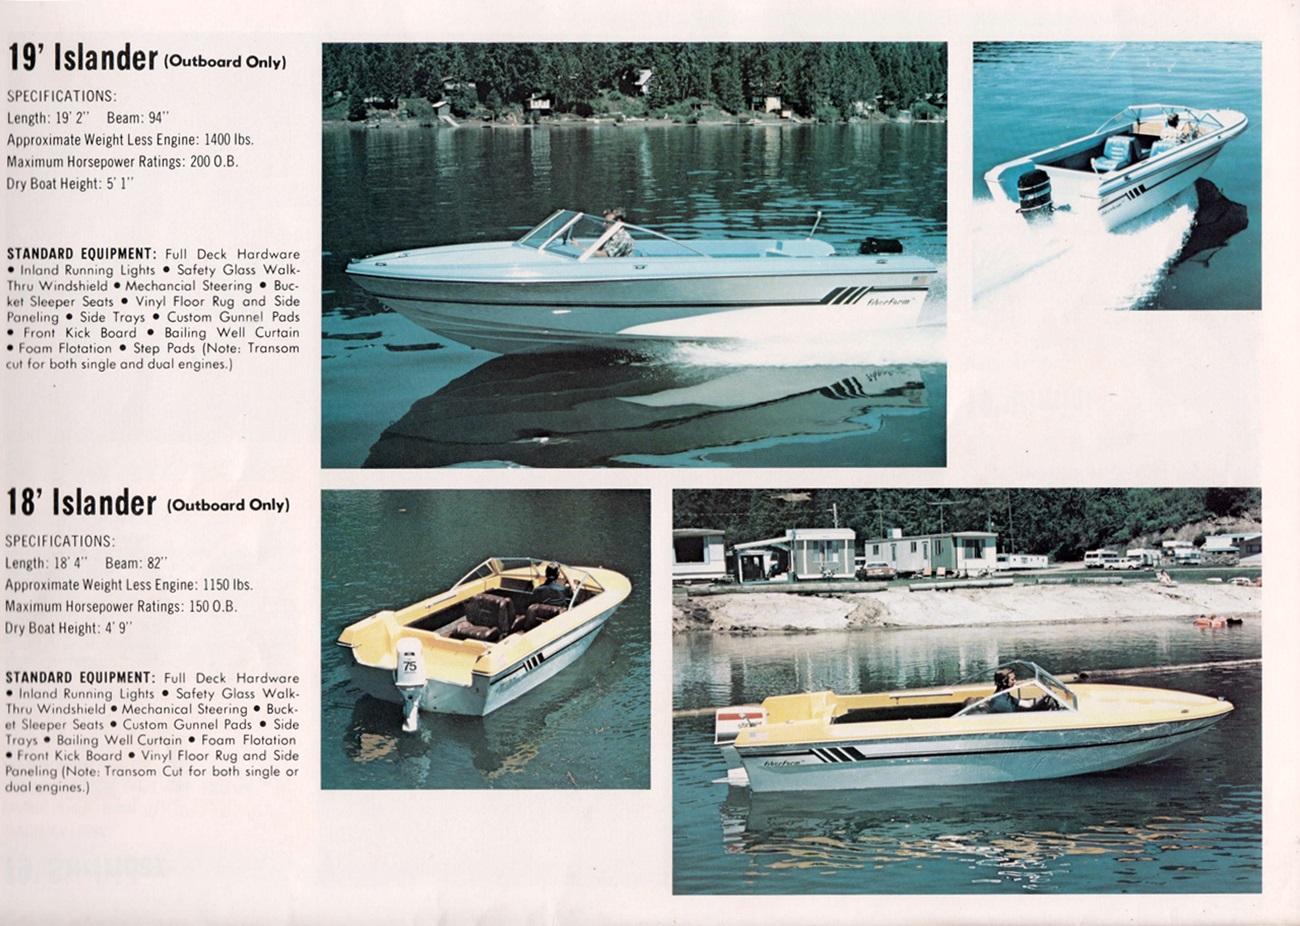 6 - Fiberform 19 Islander 001.jpg